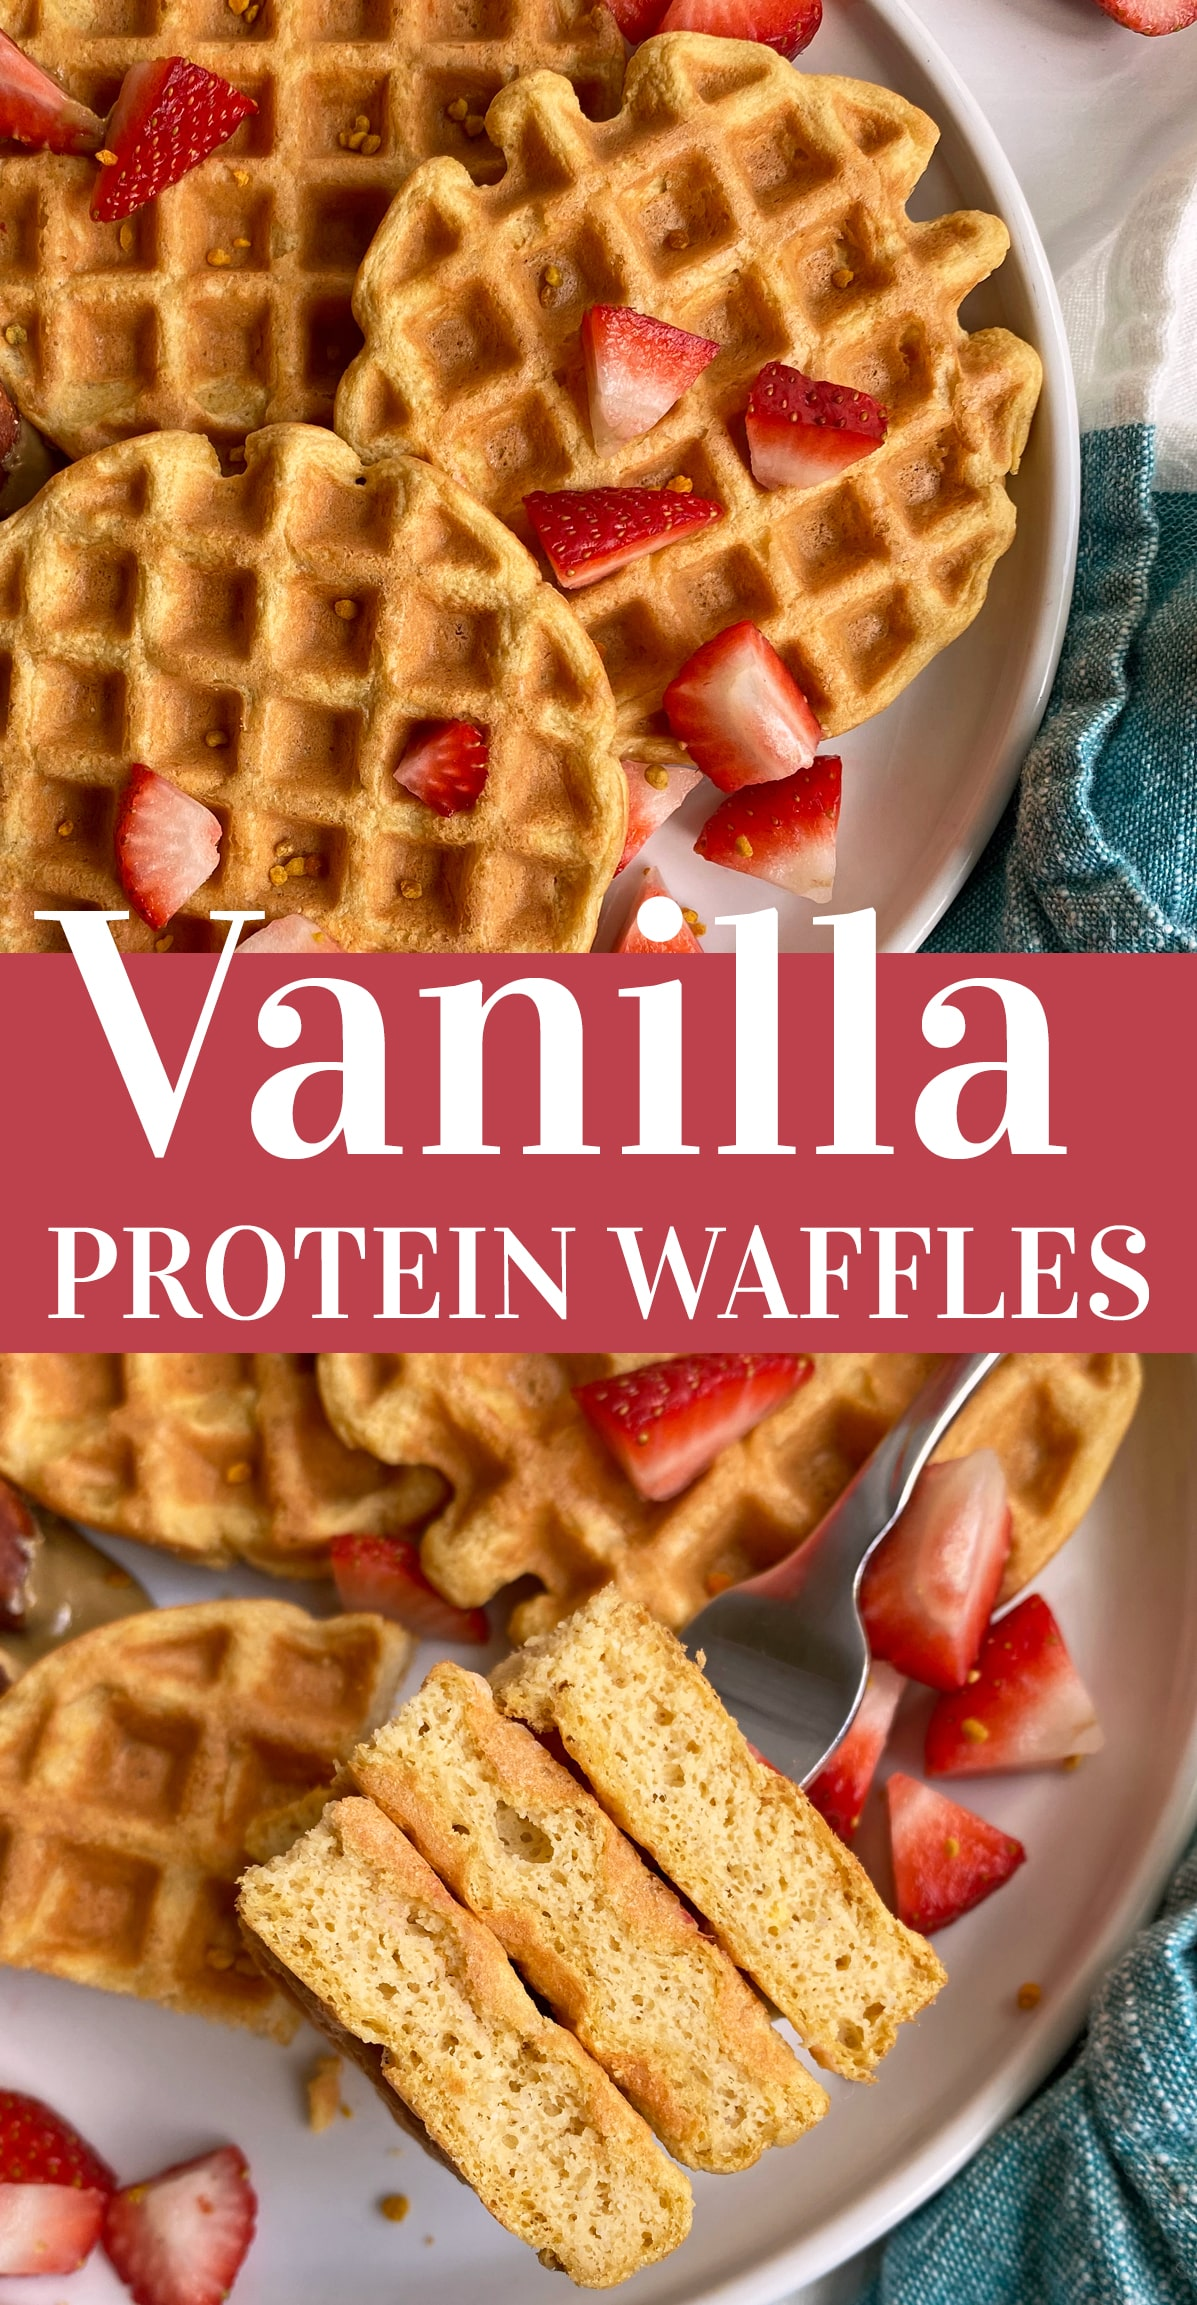 Vanilla-Protein-Waffle-Recipe-pinterest-image